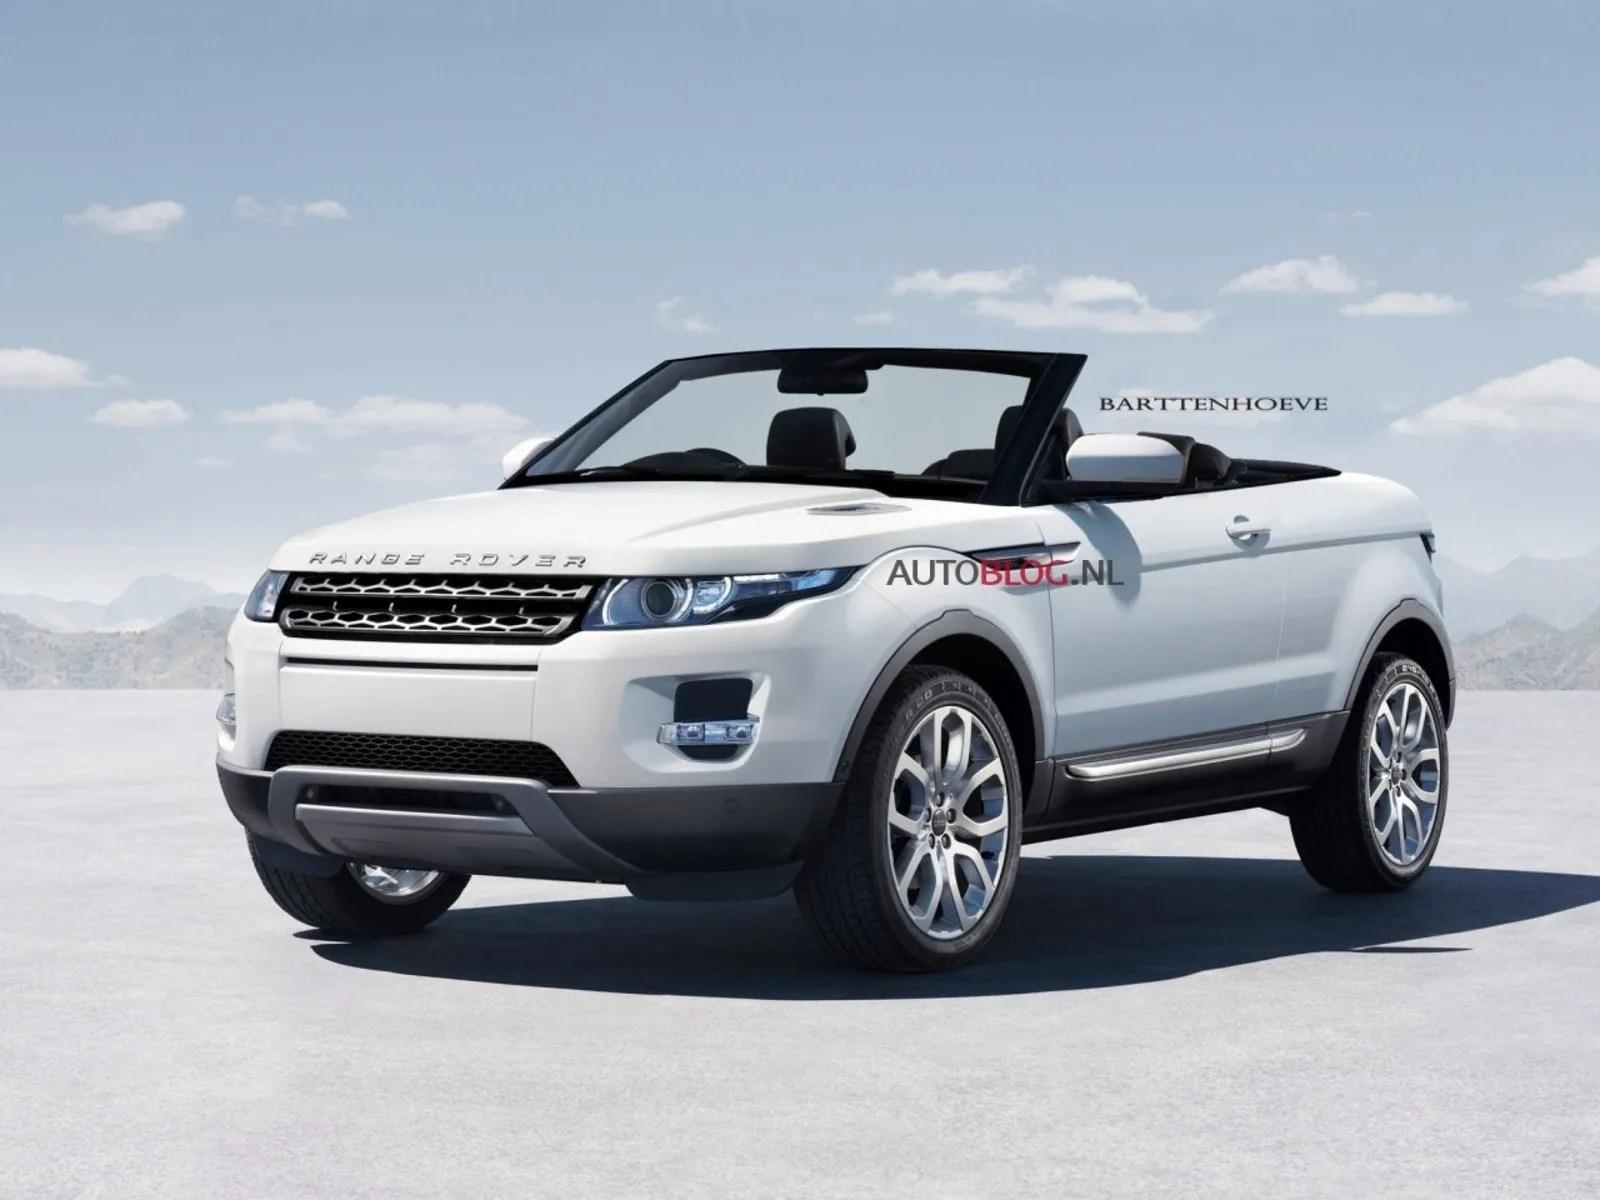 2014 Range Rover Evoque Cabrio Review Top Speed